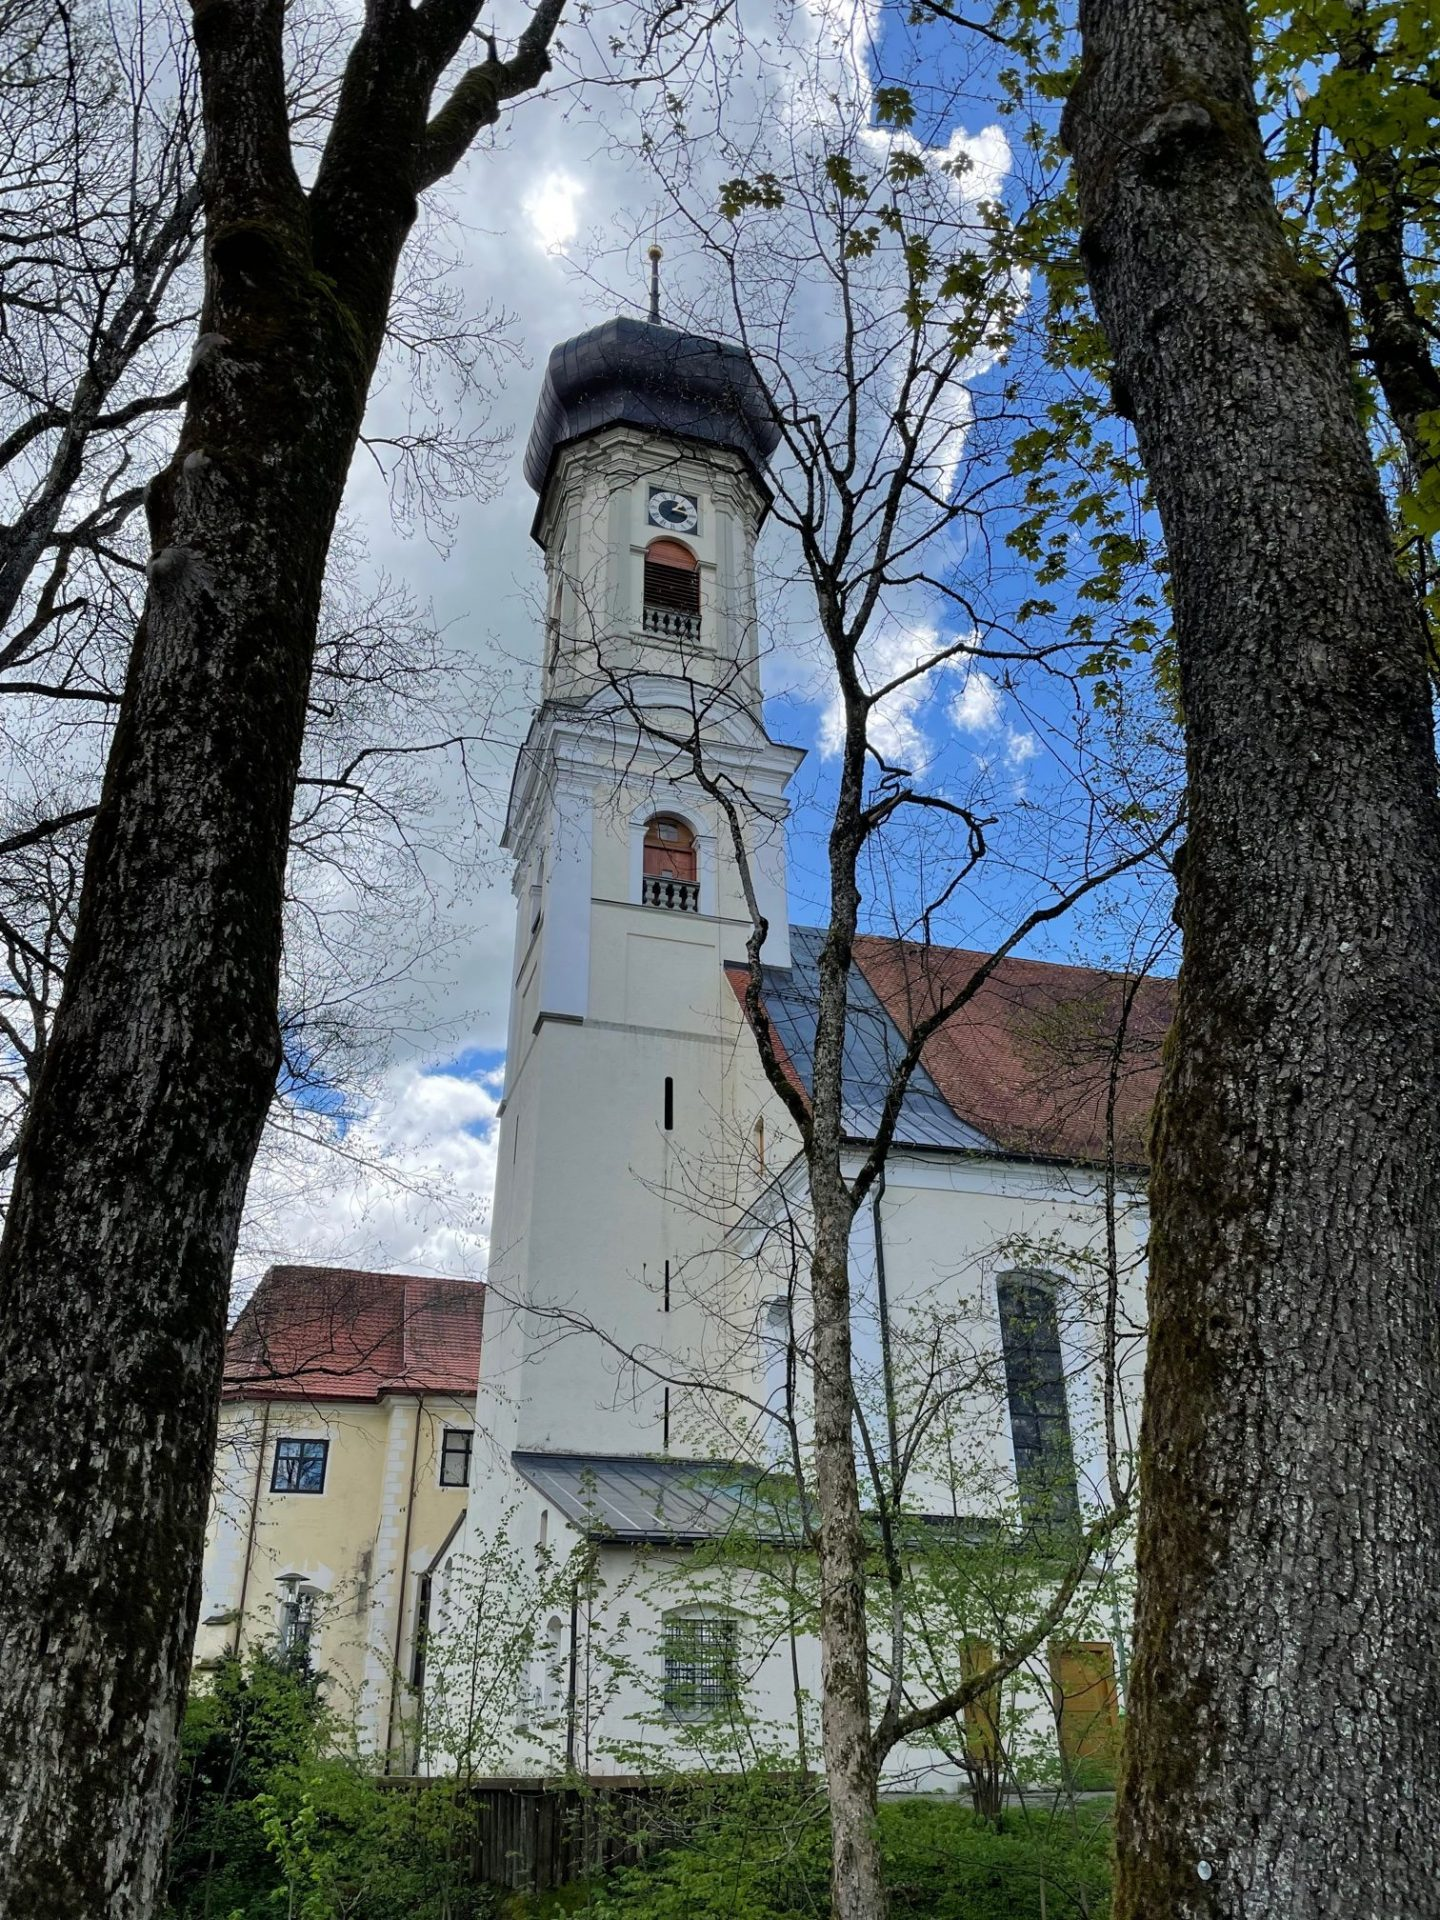 Bücherturm-Projekt: Siegerturm ist 505 PISA hoch